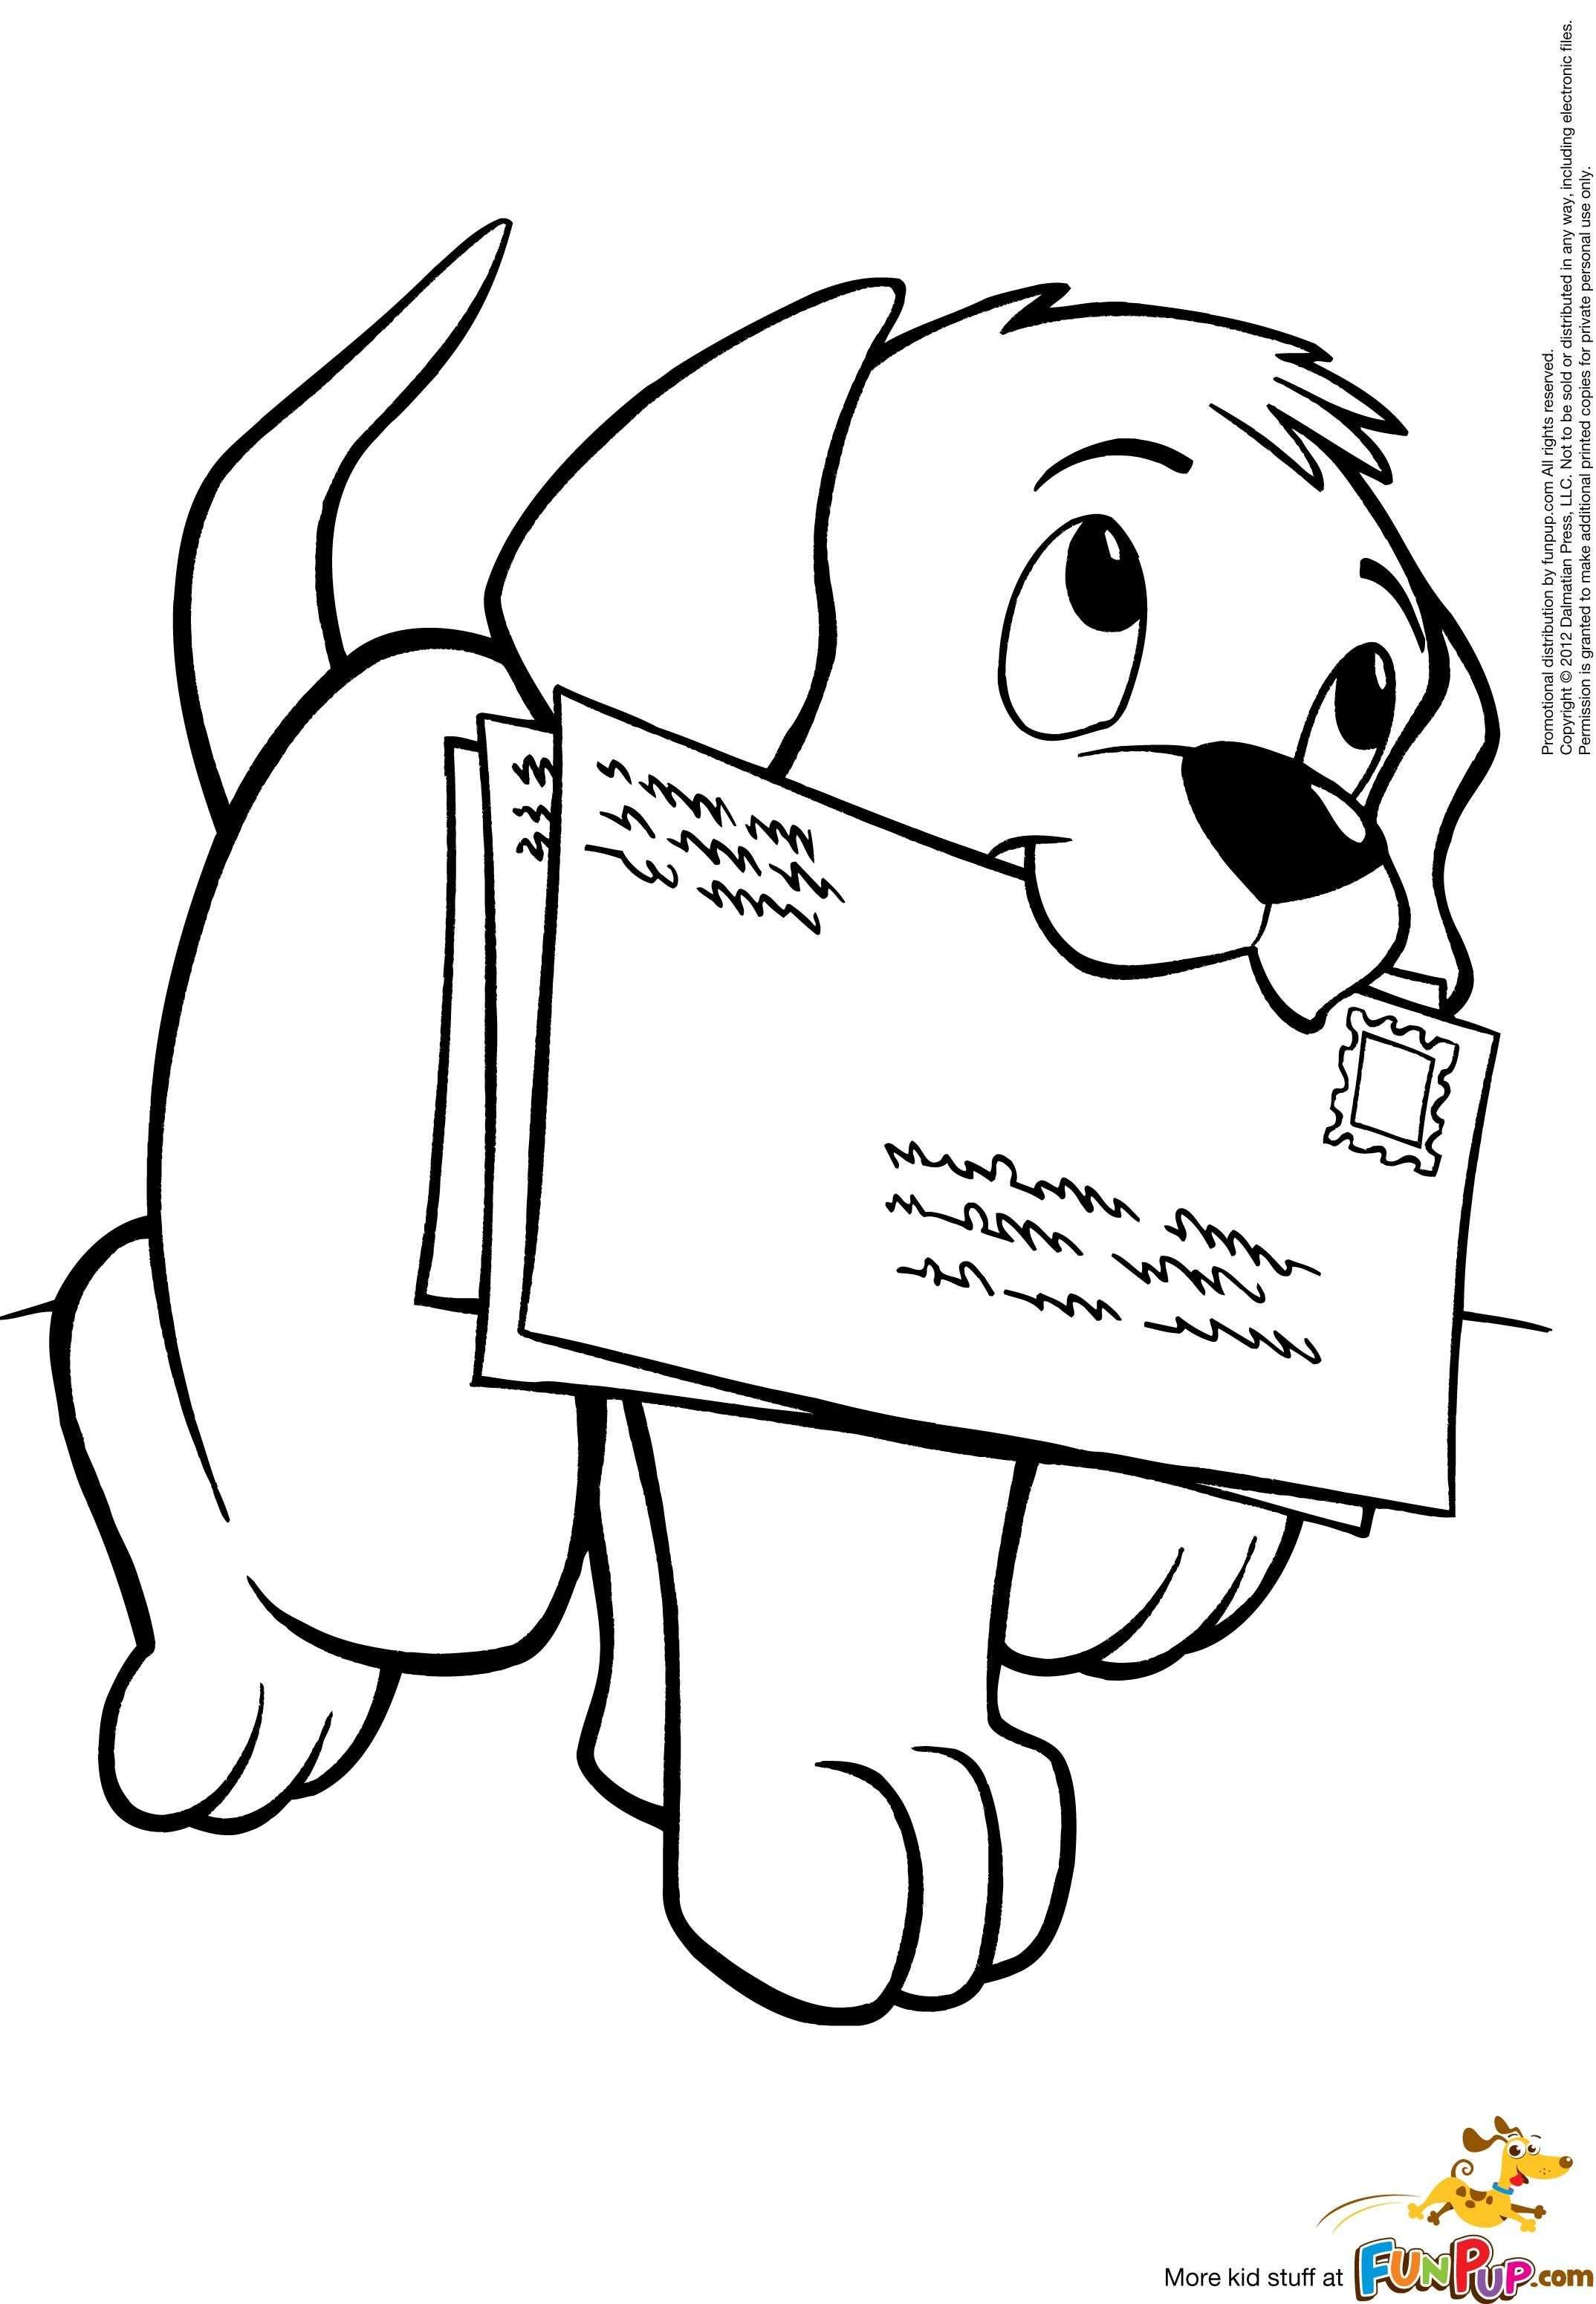 Printable Puppy Coloring Pages Free Met Afbeeldingen